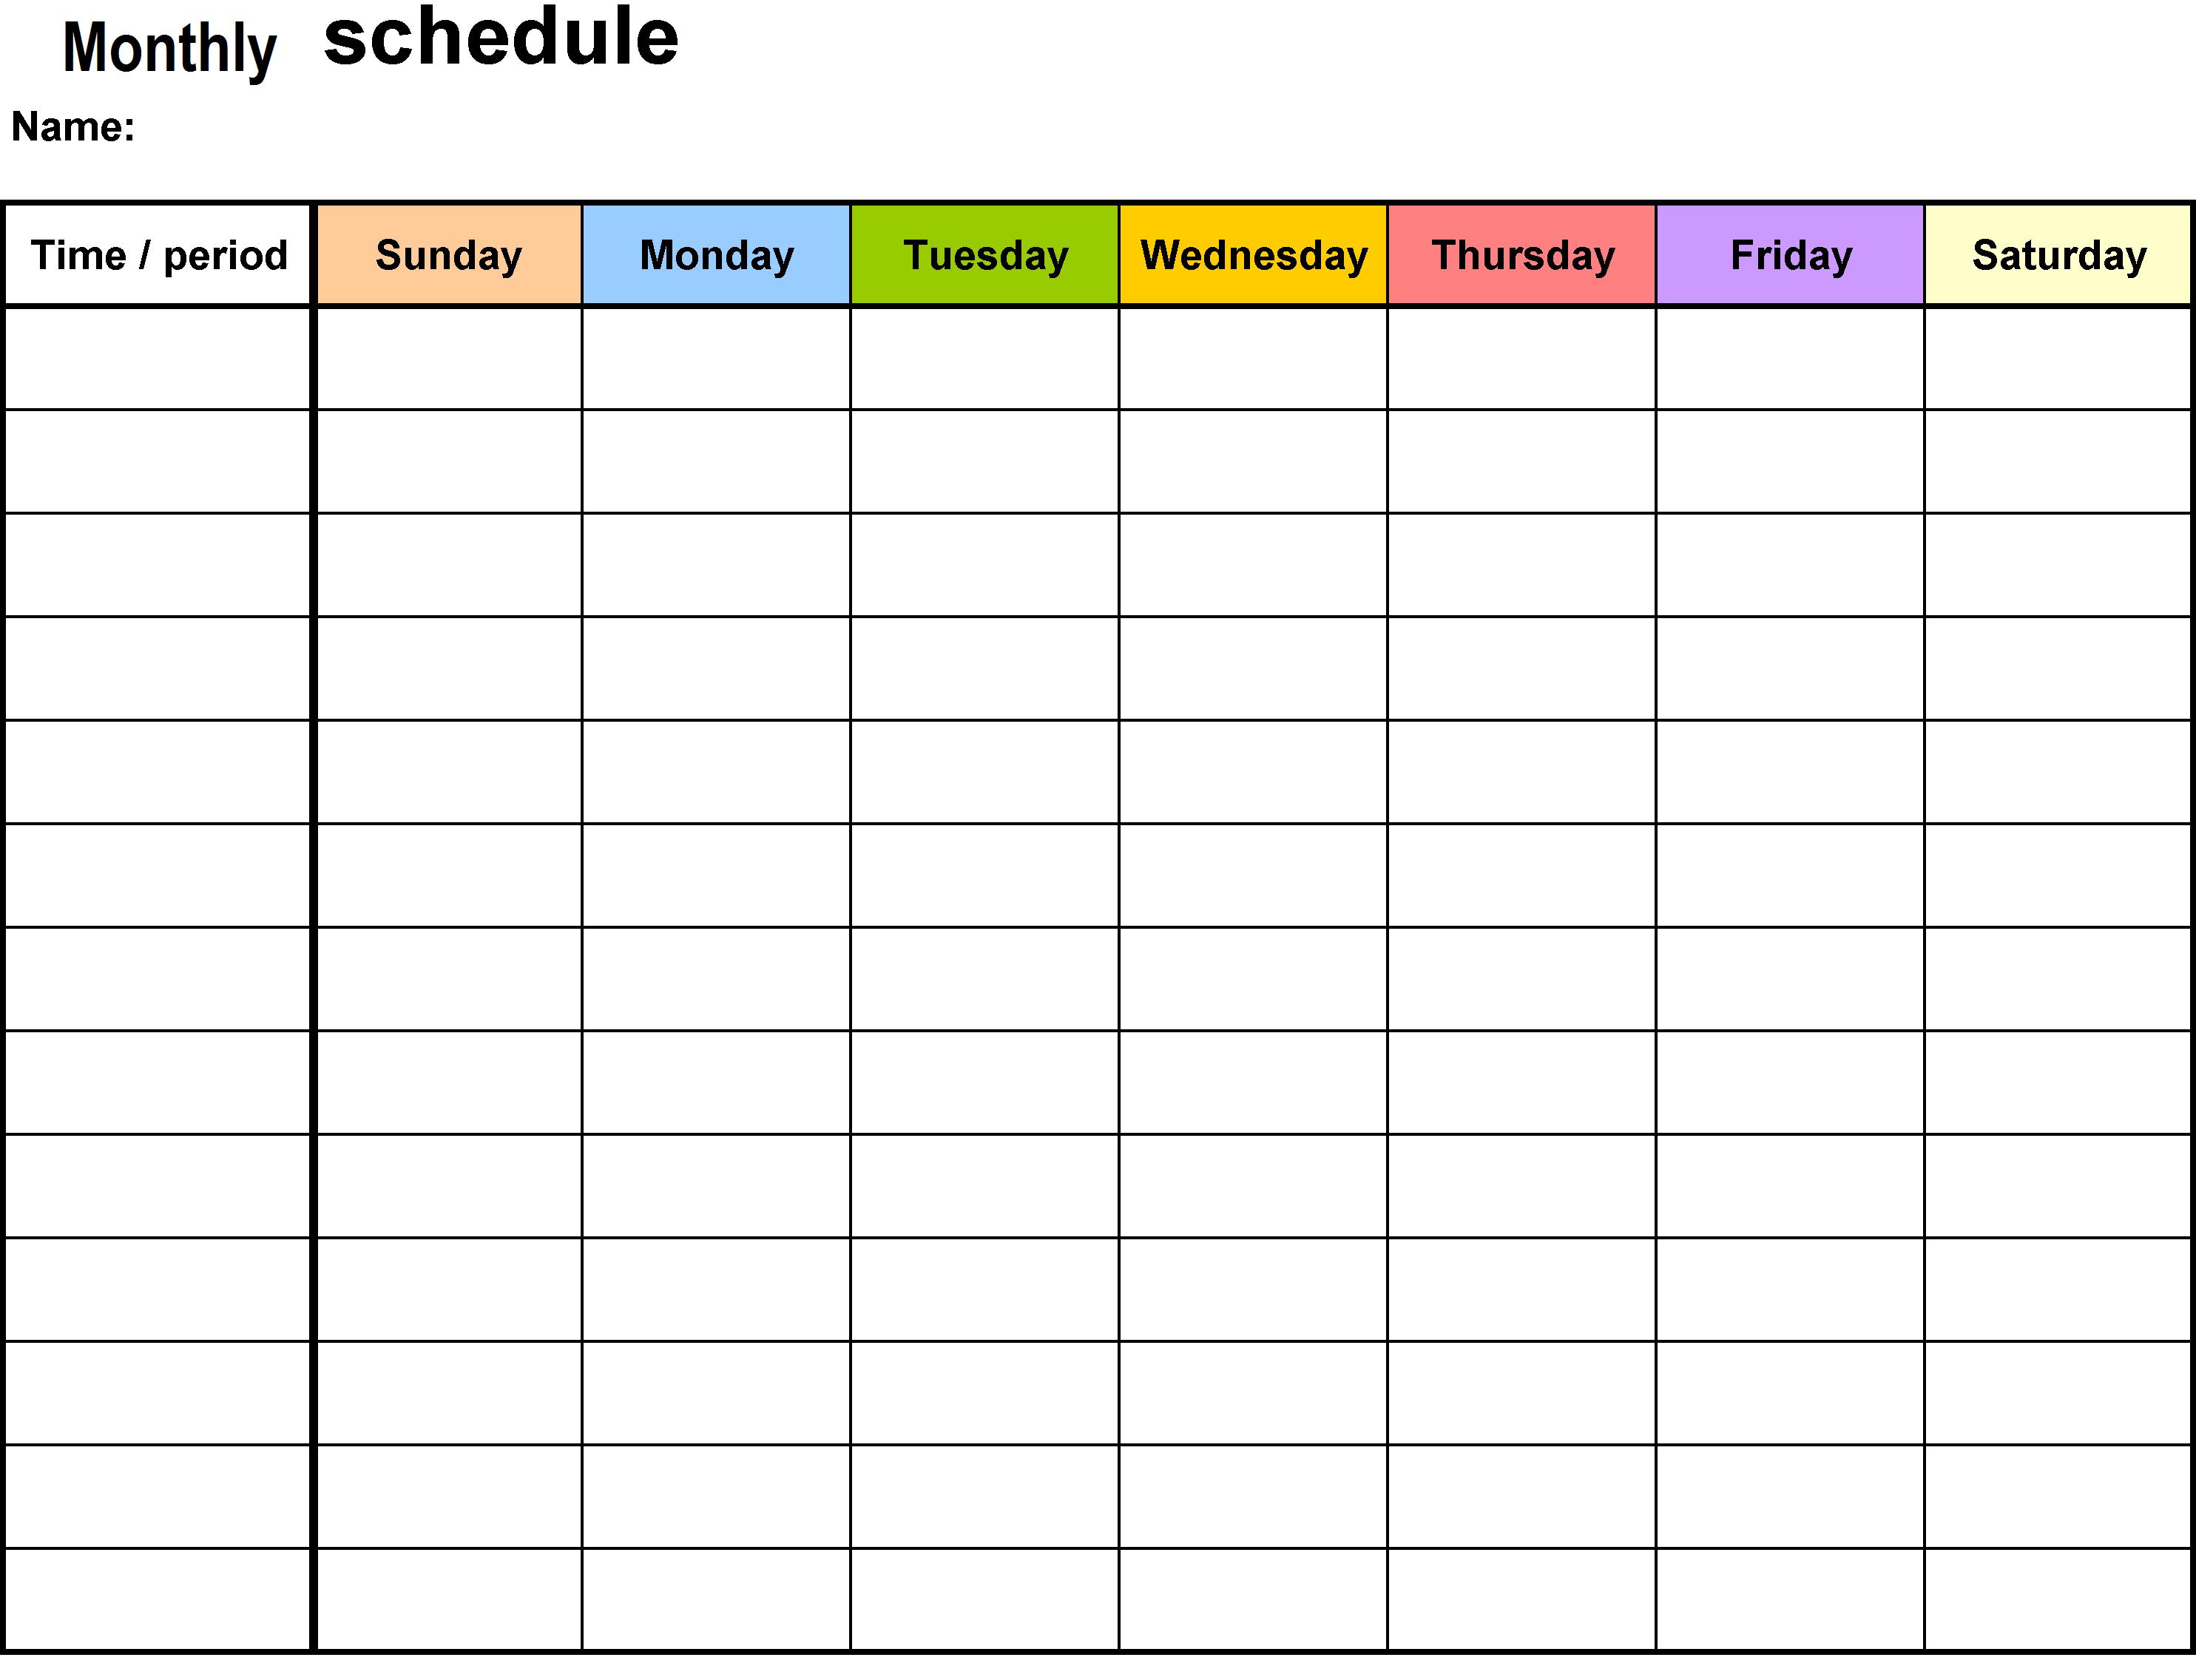 Monthly Schedule Planner Template